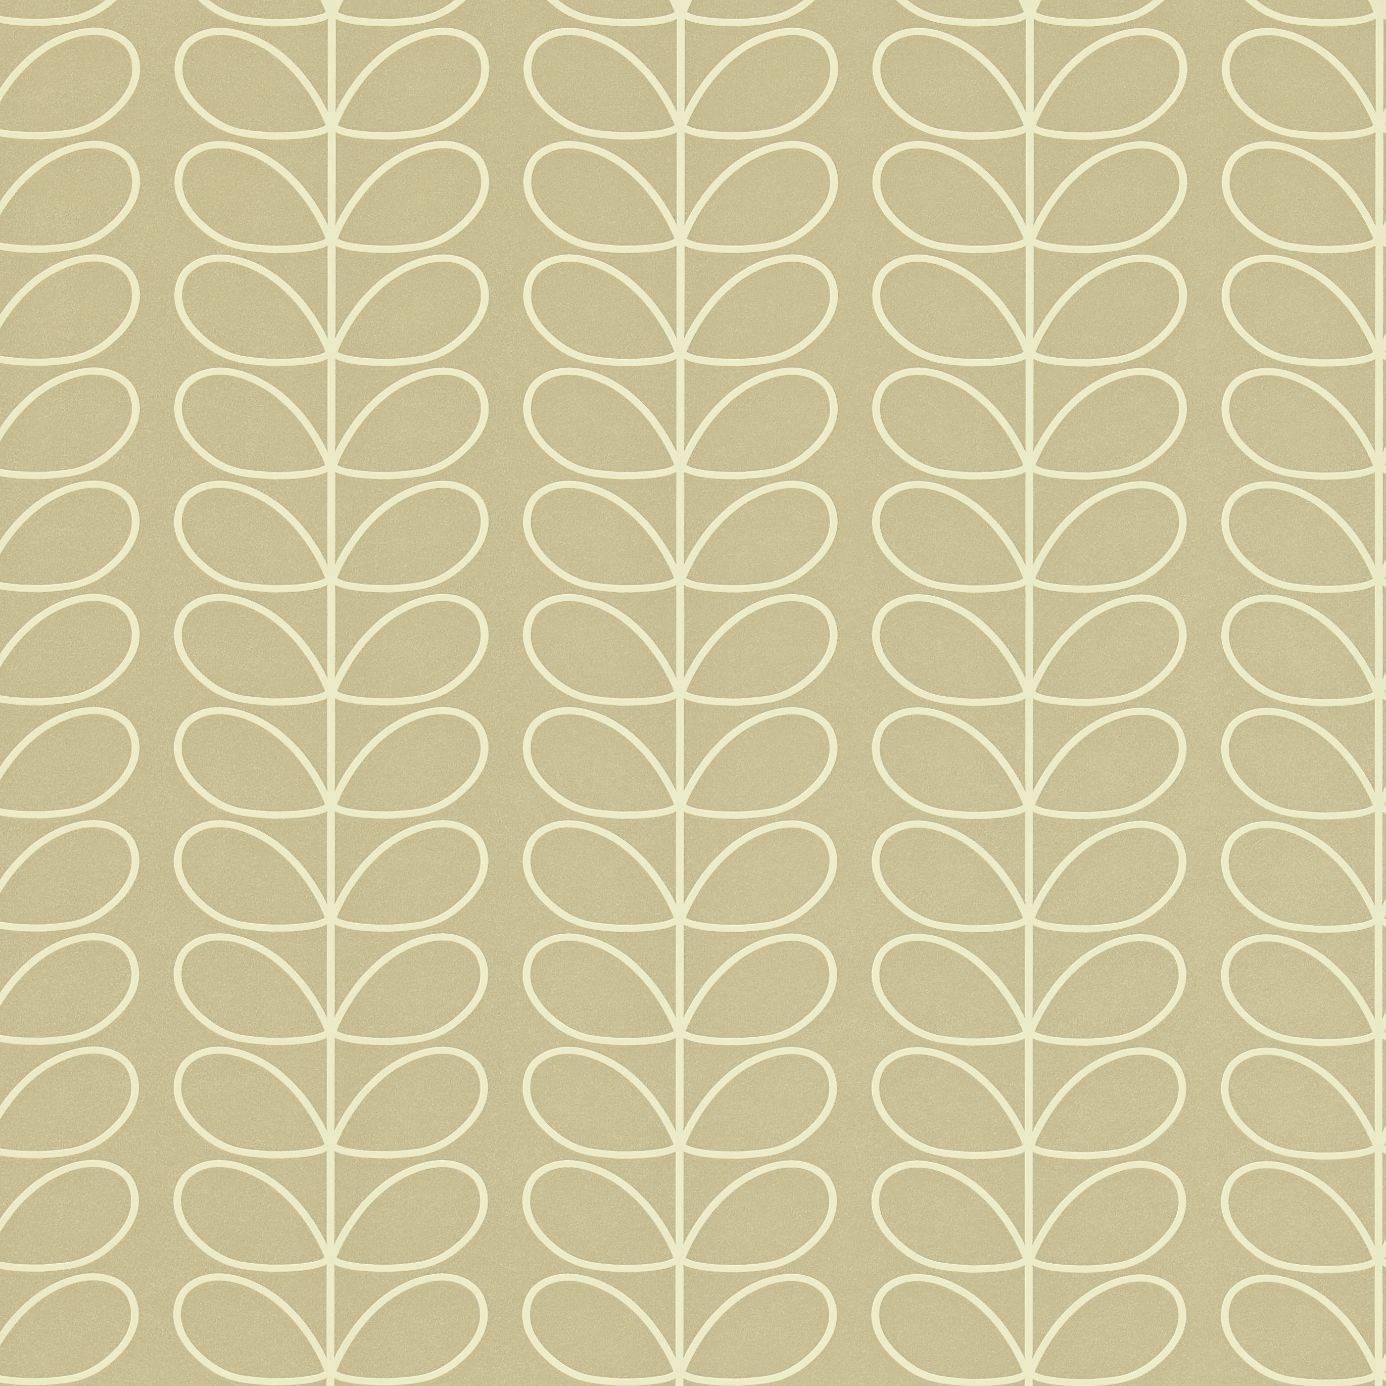 Harlequin Linear Stem Wallpaper Stoneproduct Code 110397